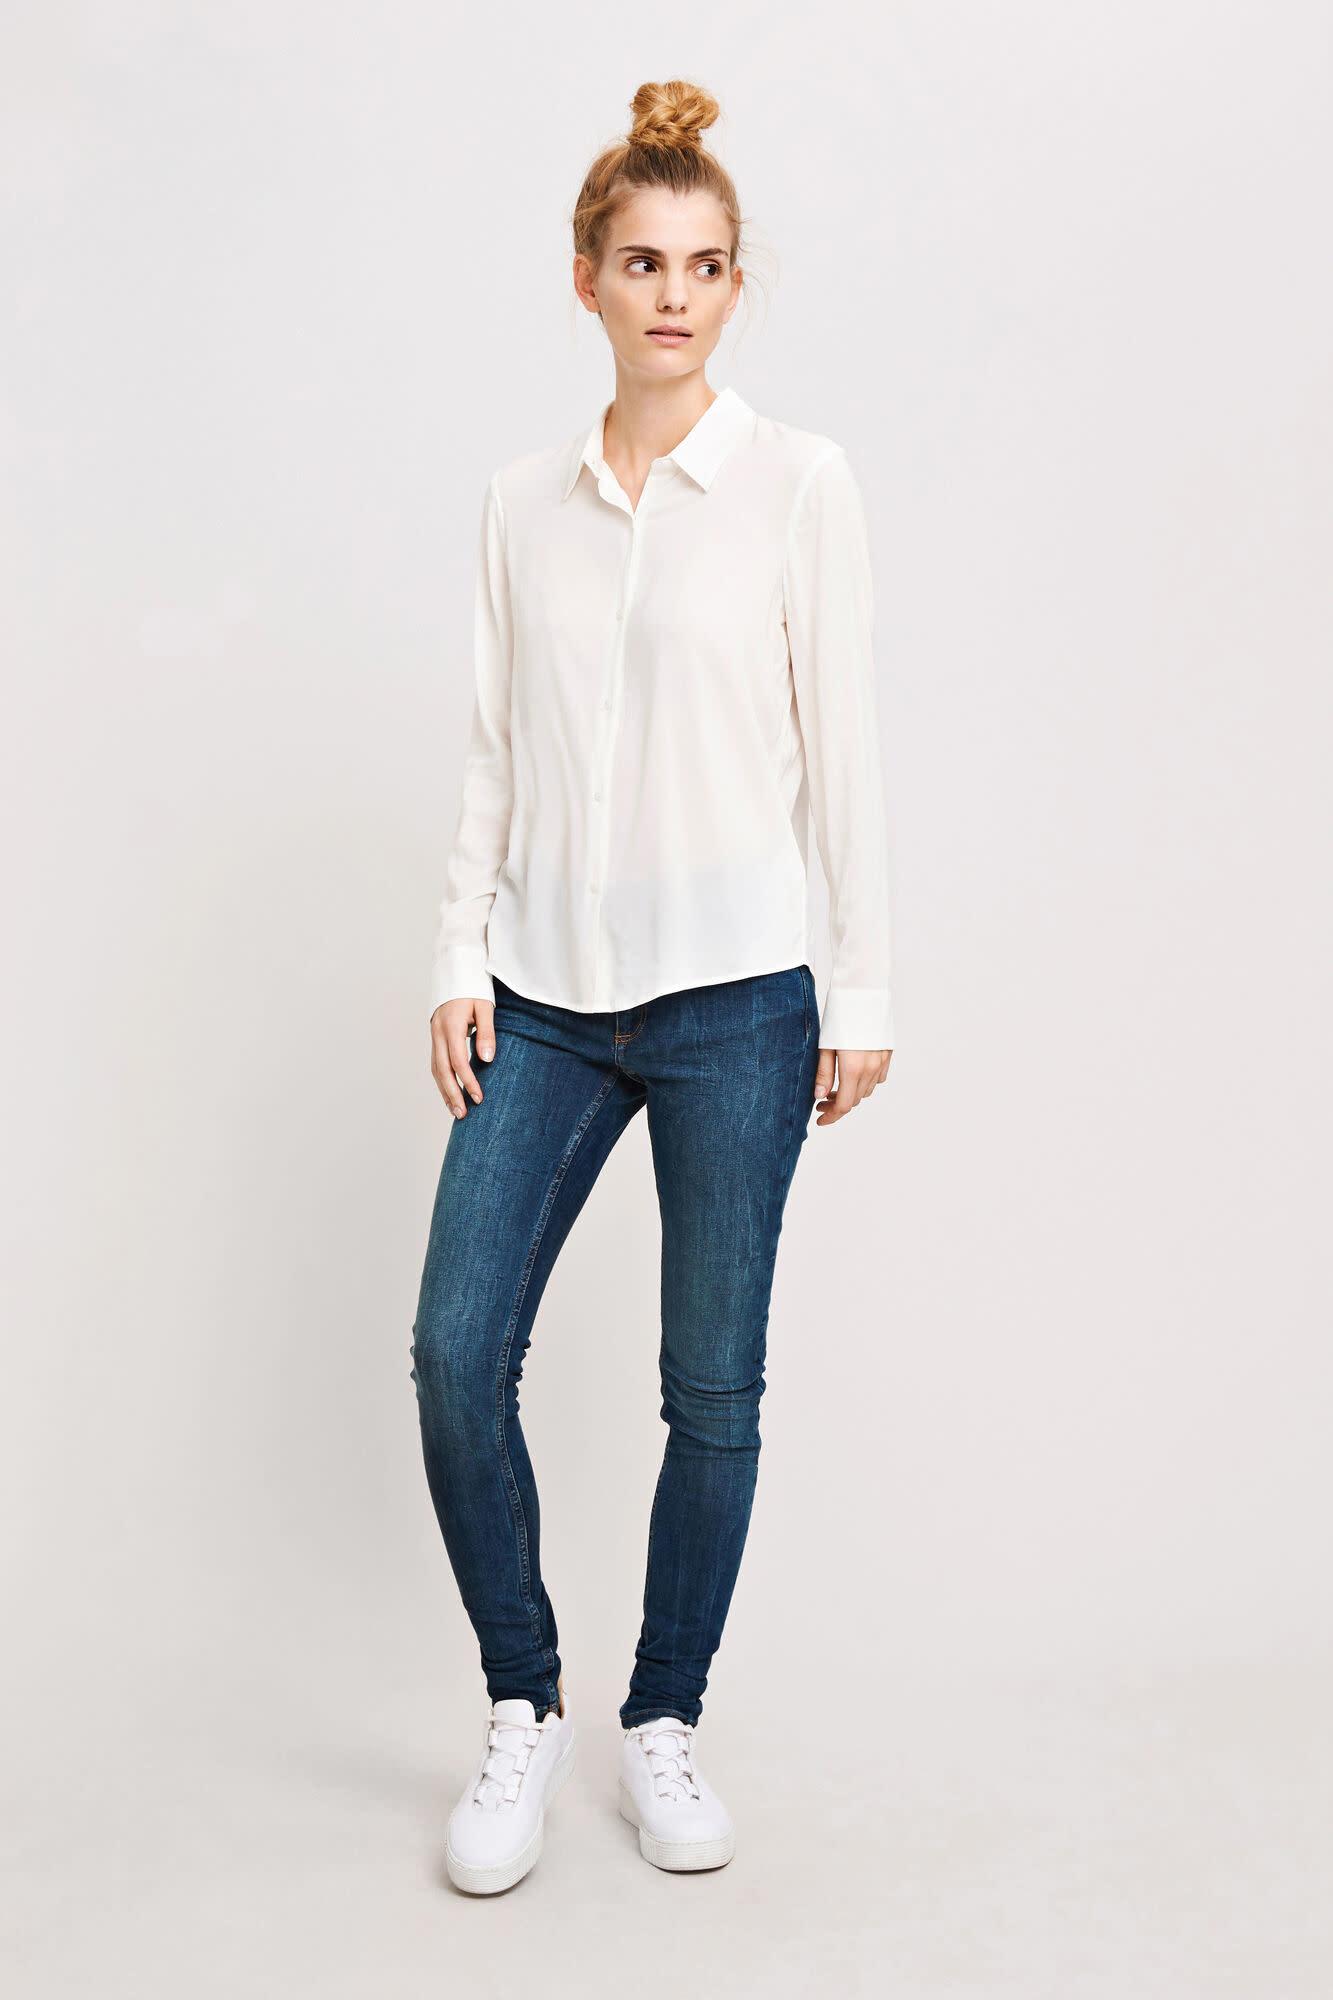 milly np shirt samsoe samsoe-2